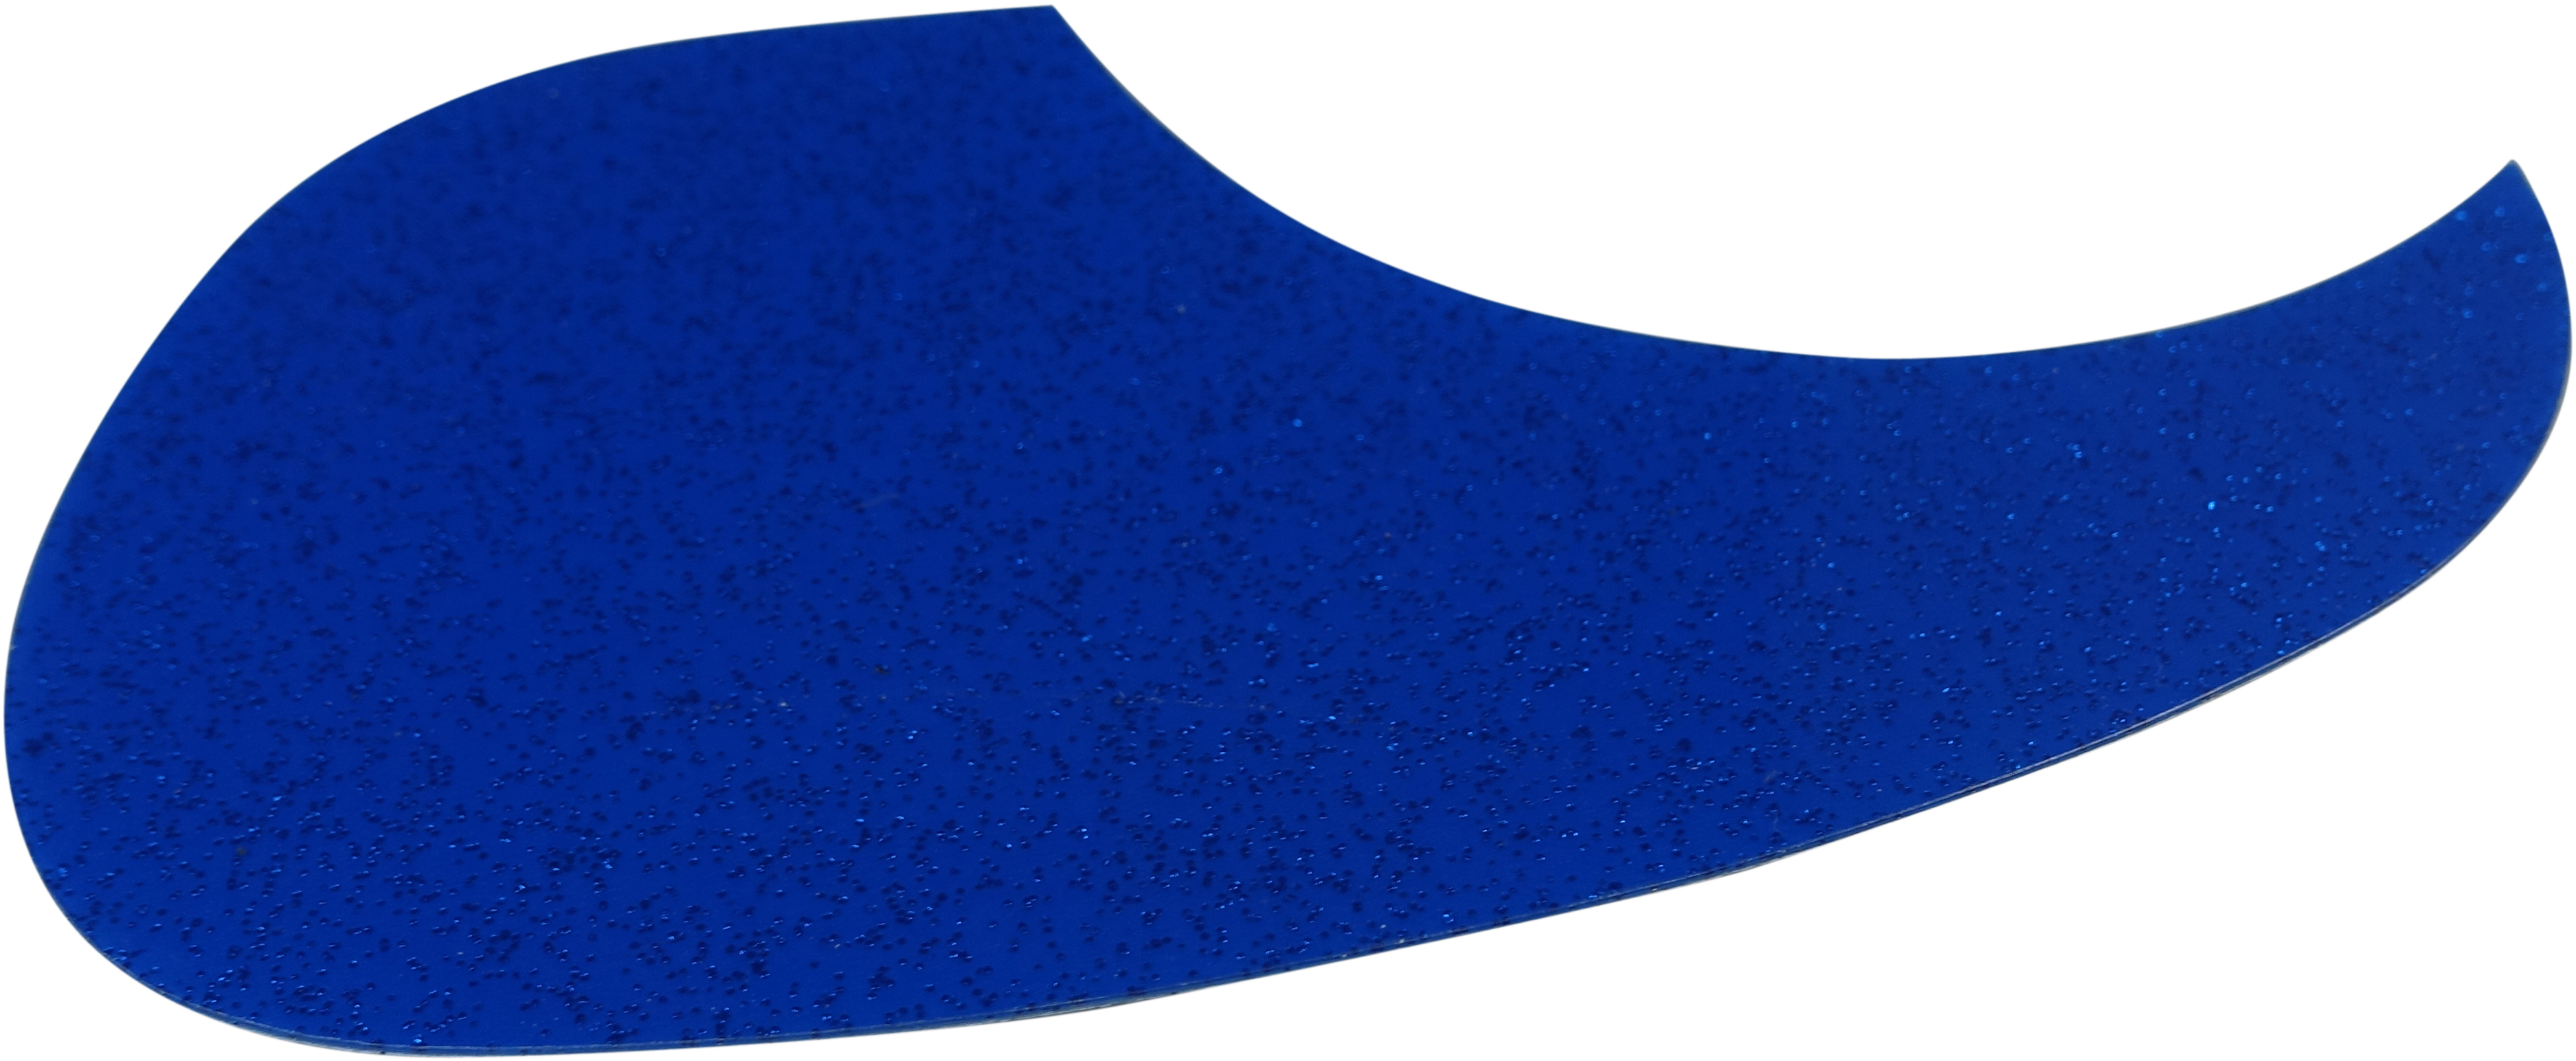 Toronzo Pickguard AC-ADH-2PLY-Sparkle Blue